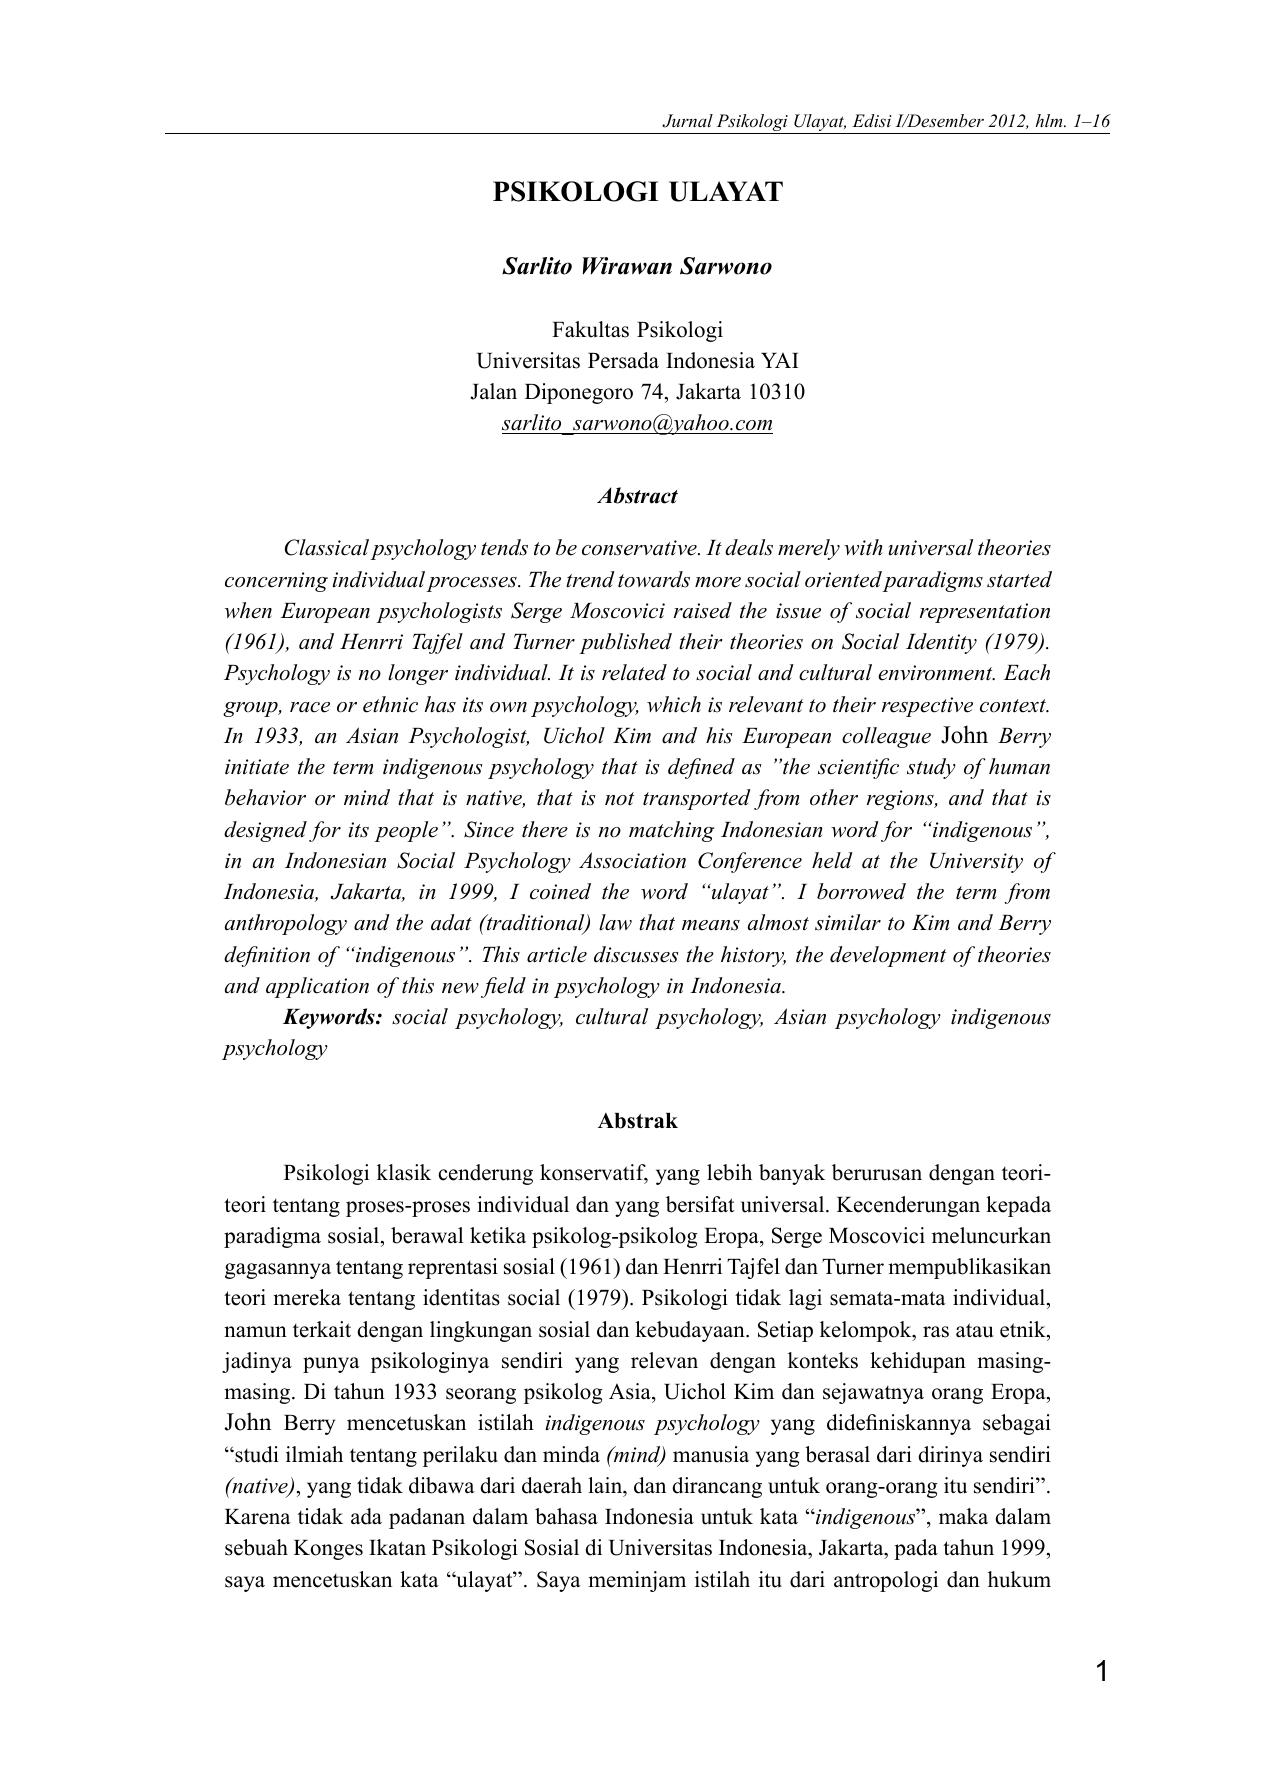 Essays on cultural clash